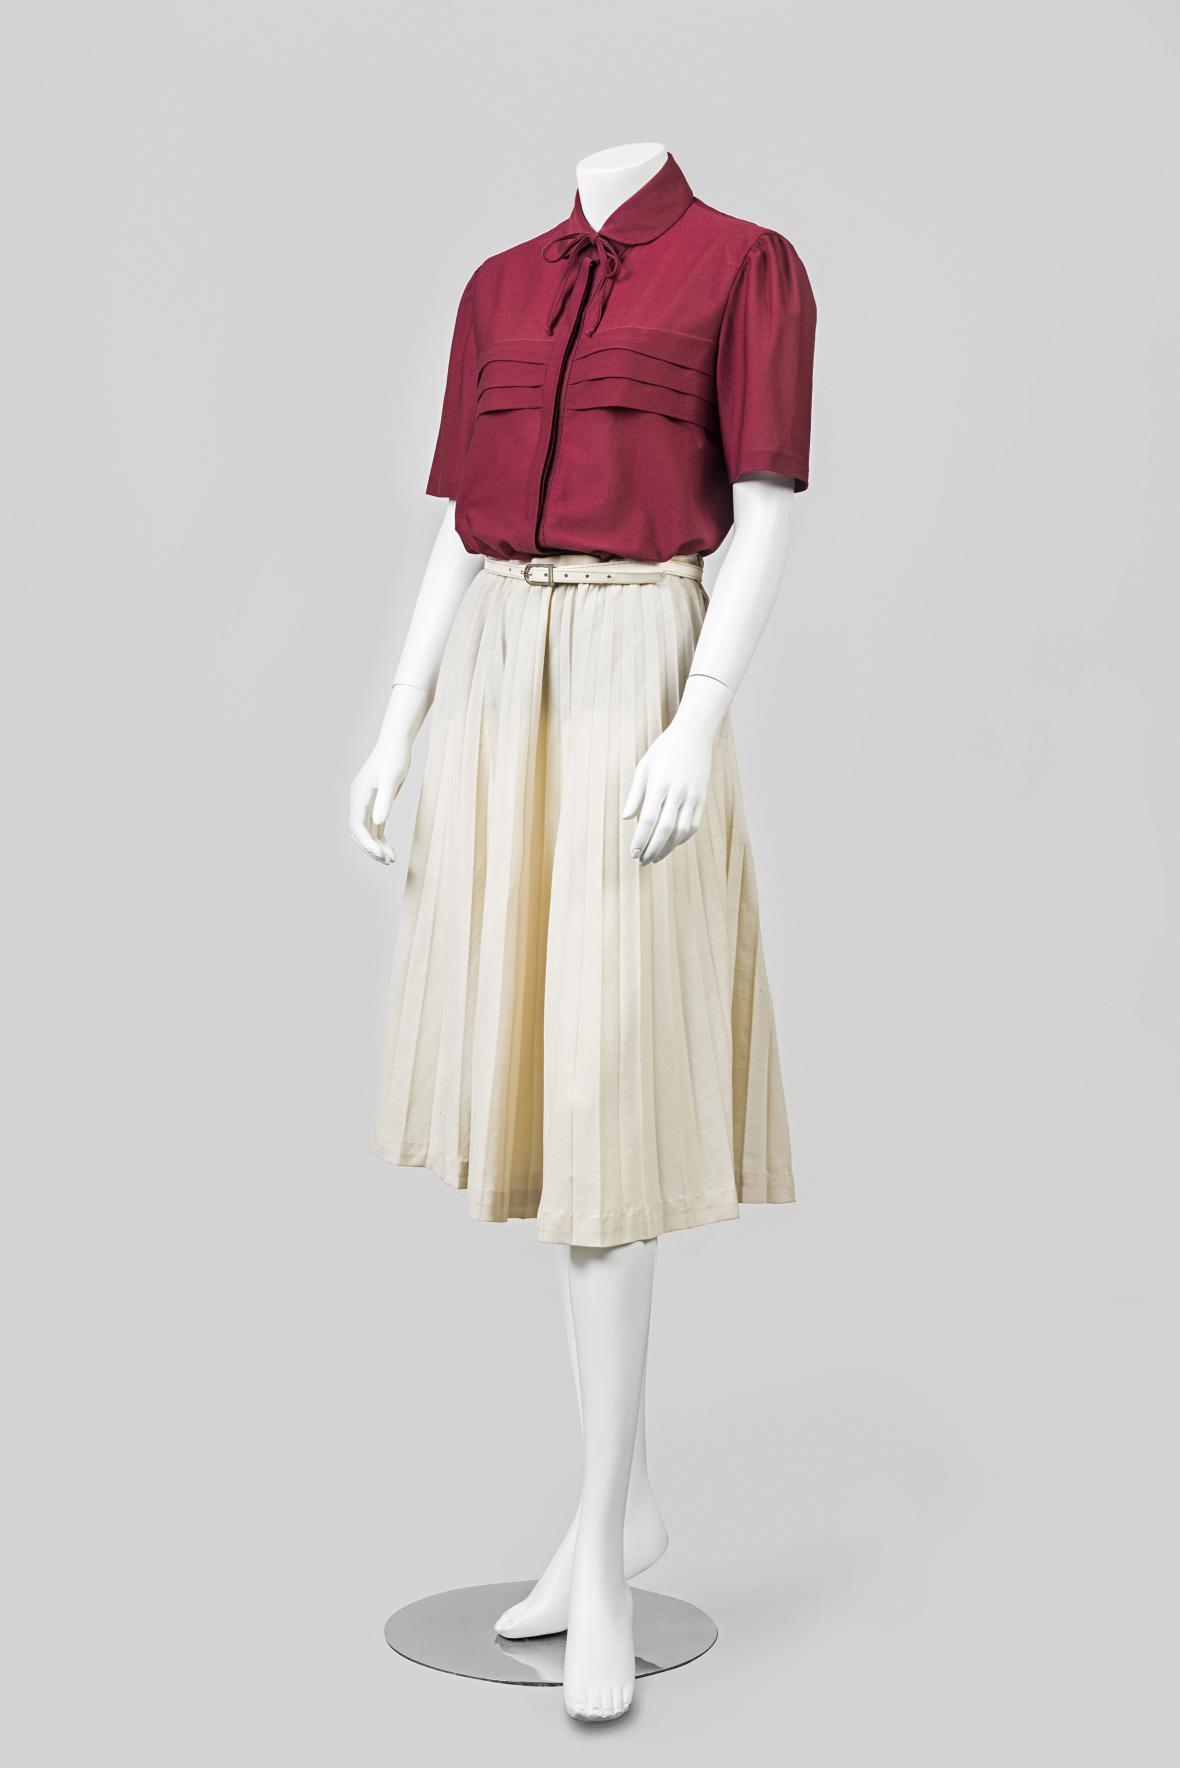 Dámska blůzka a skládaná sukně. Makyta, Púchov. 70. léta 20. století; syntetický materiál